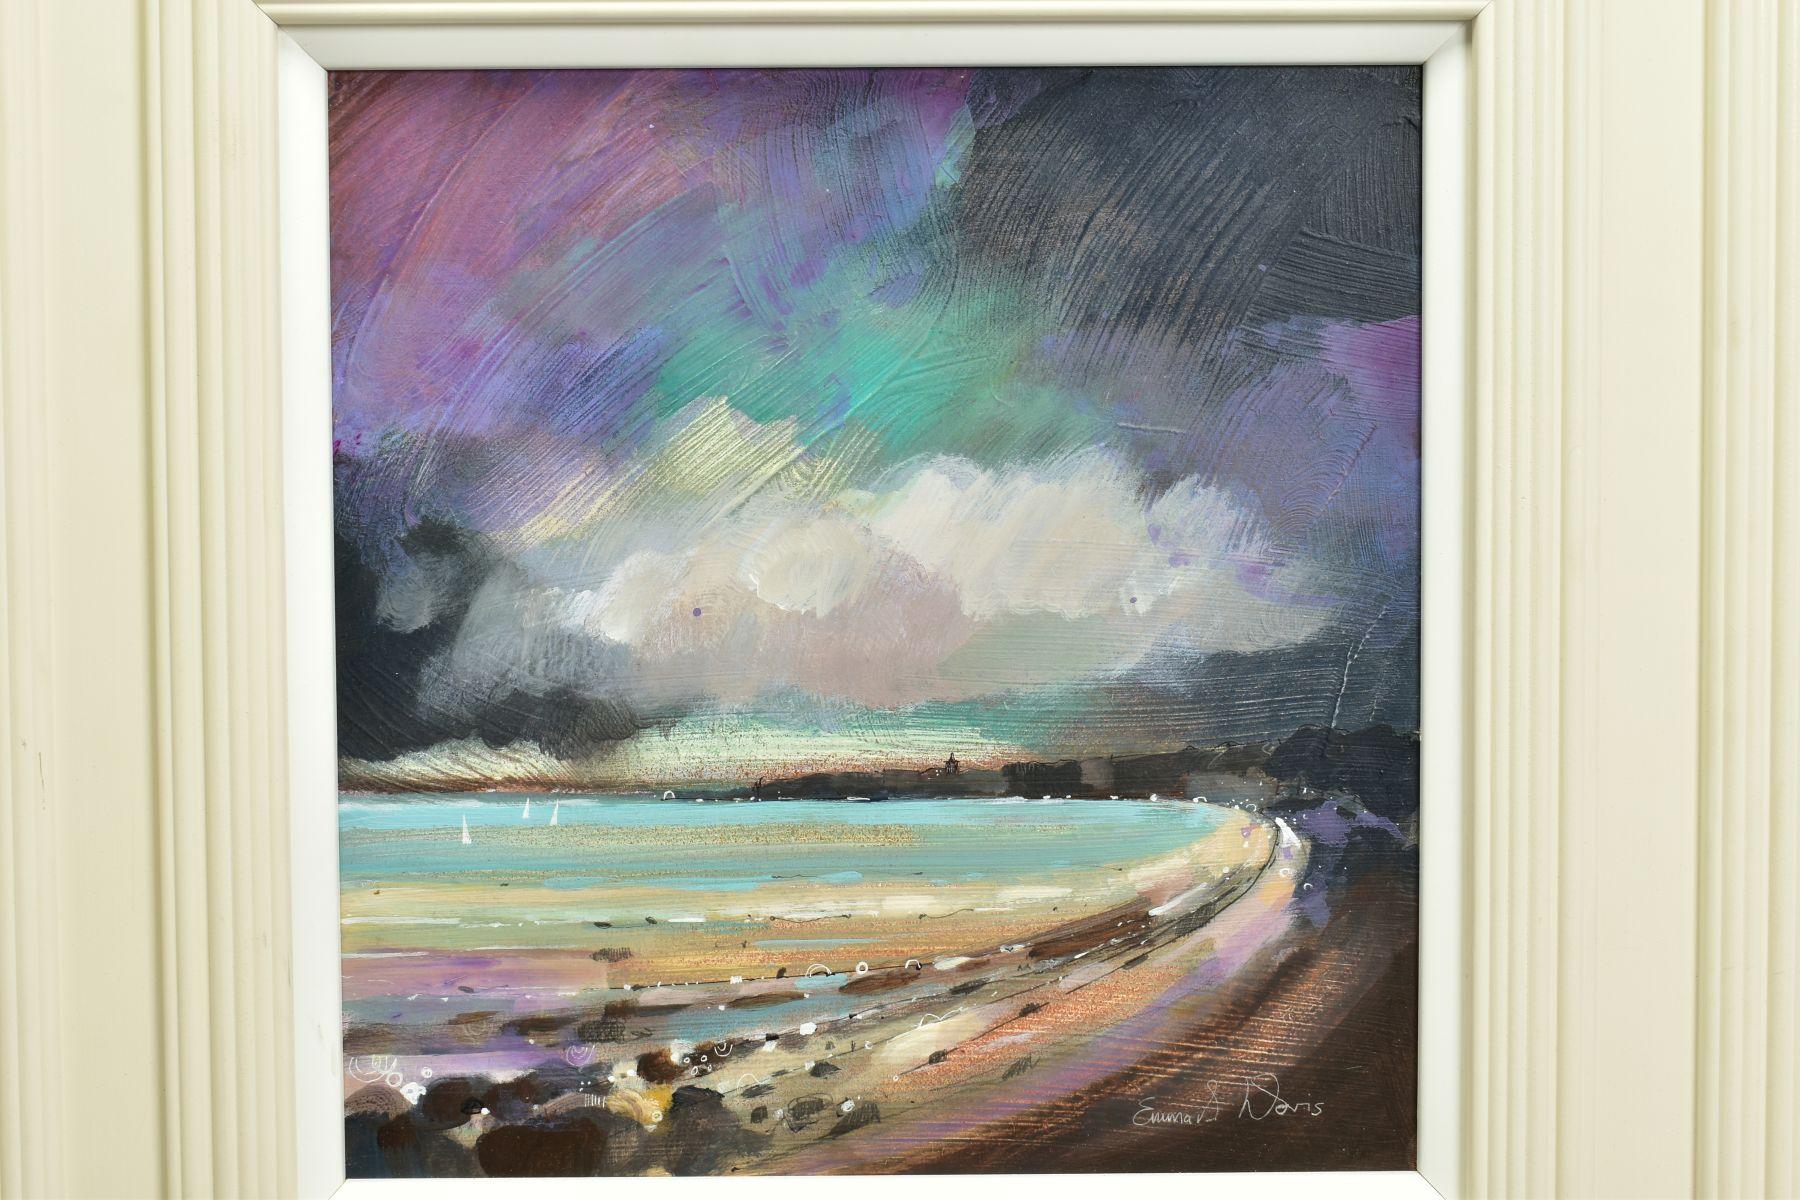 EMMA S. DAVIS (BRITISH 1975), 'Sailing at St Andrews', a Scottish coastal landscape, signed bottom - Image 2 of 6